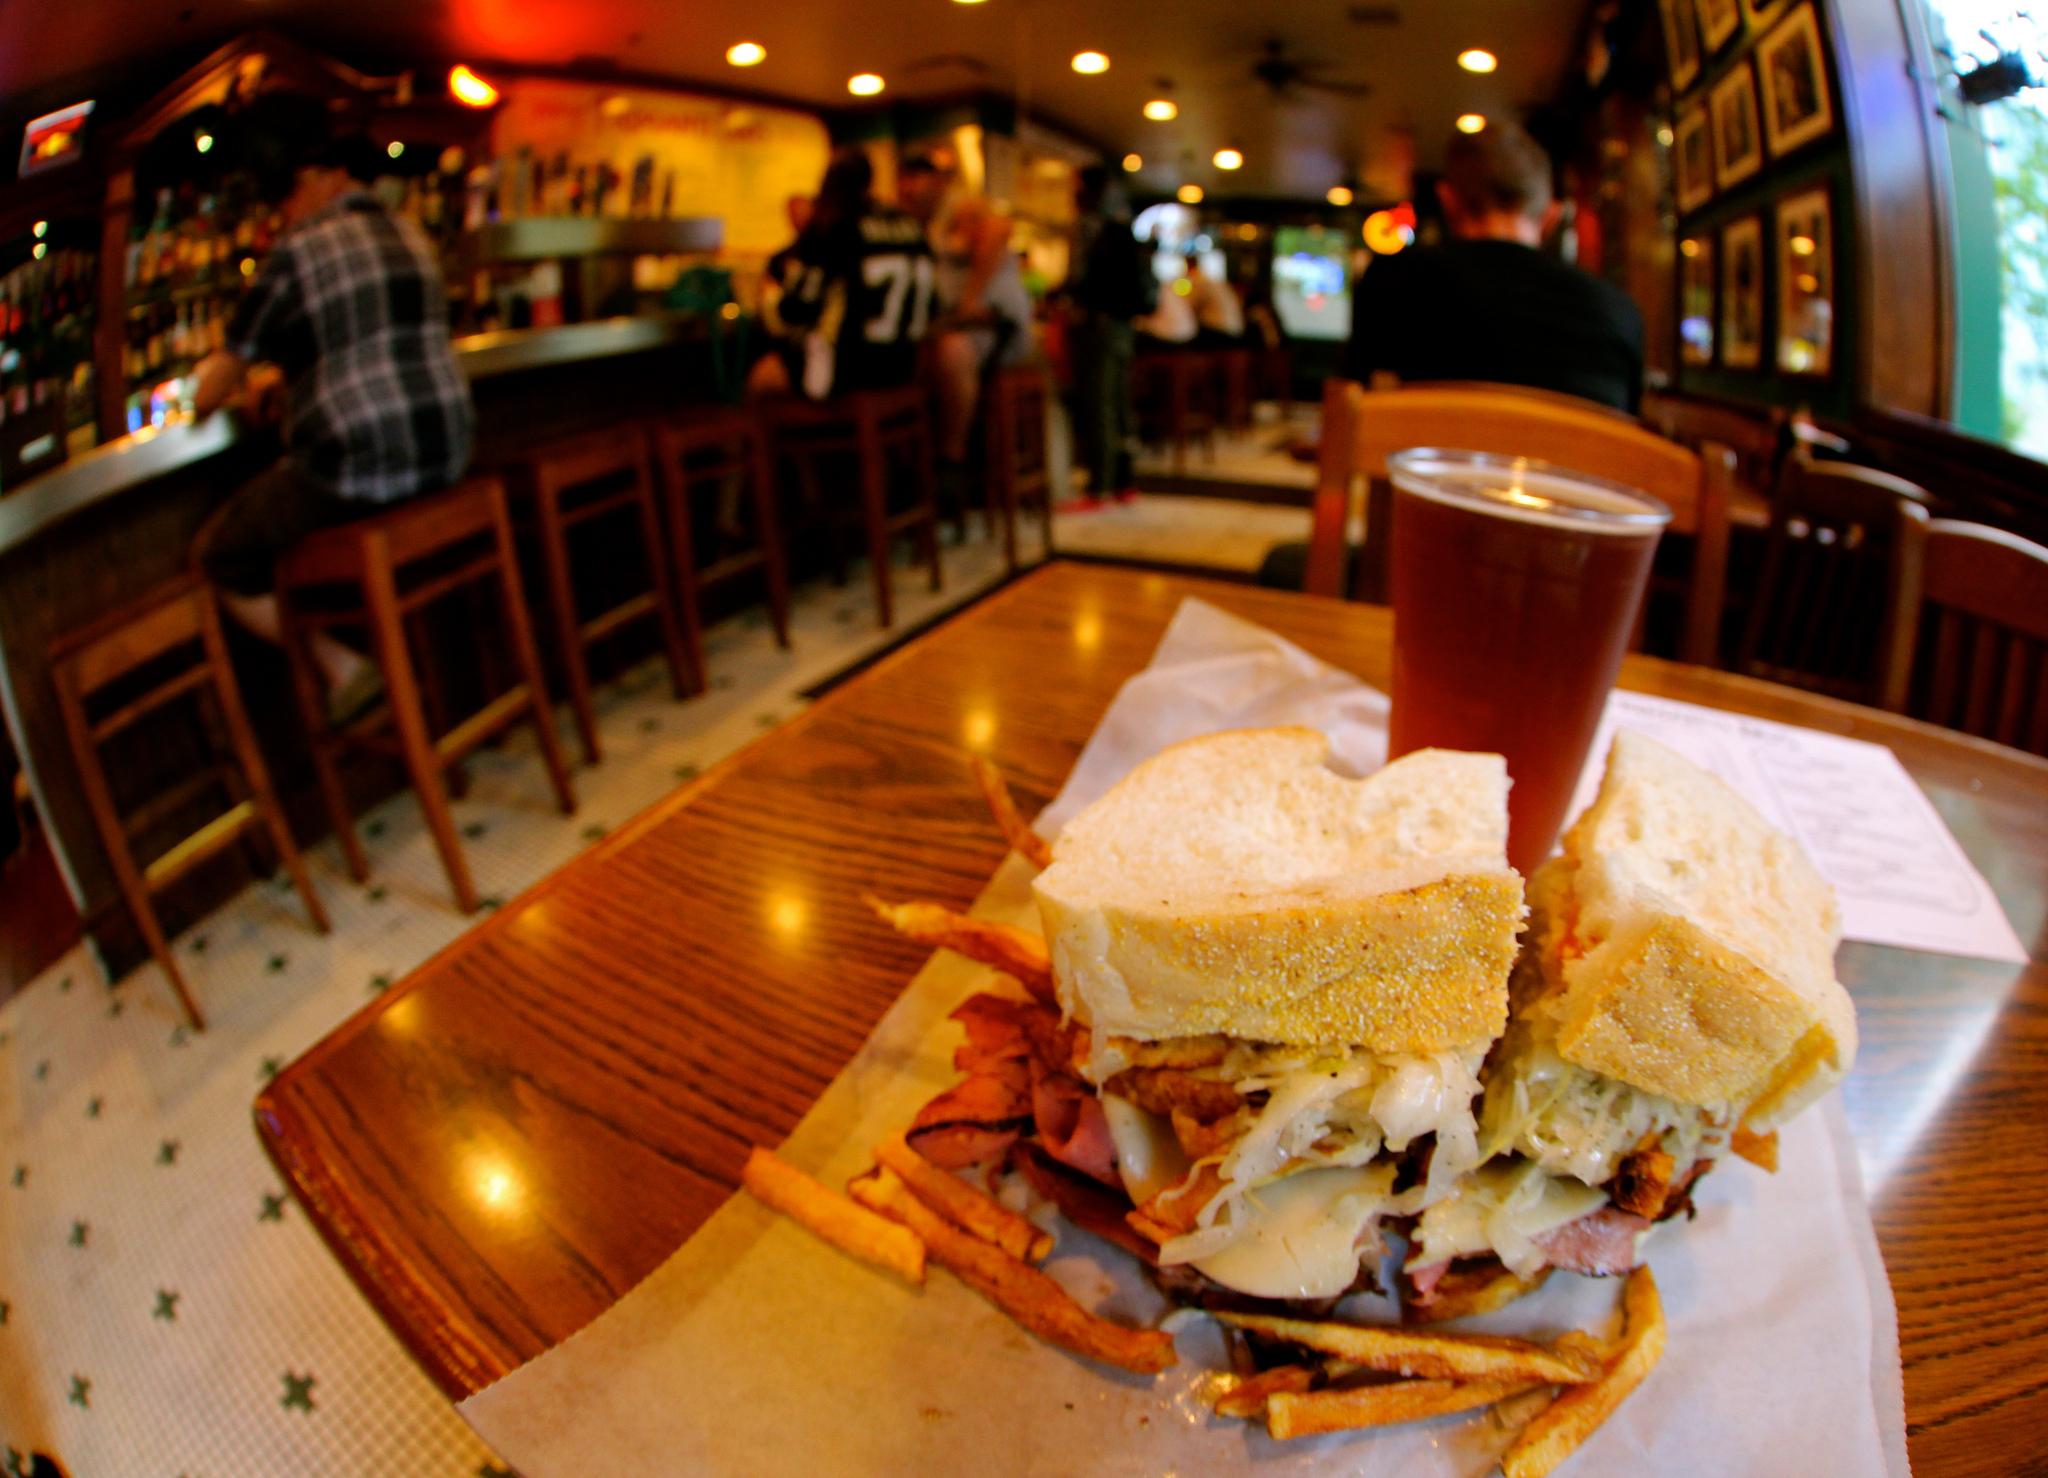 The Top 10 Restaurants In Monroeville, Pennsylvania